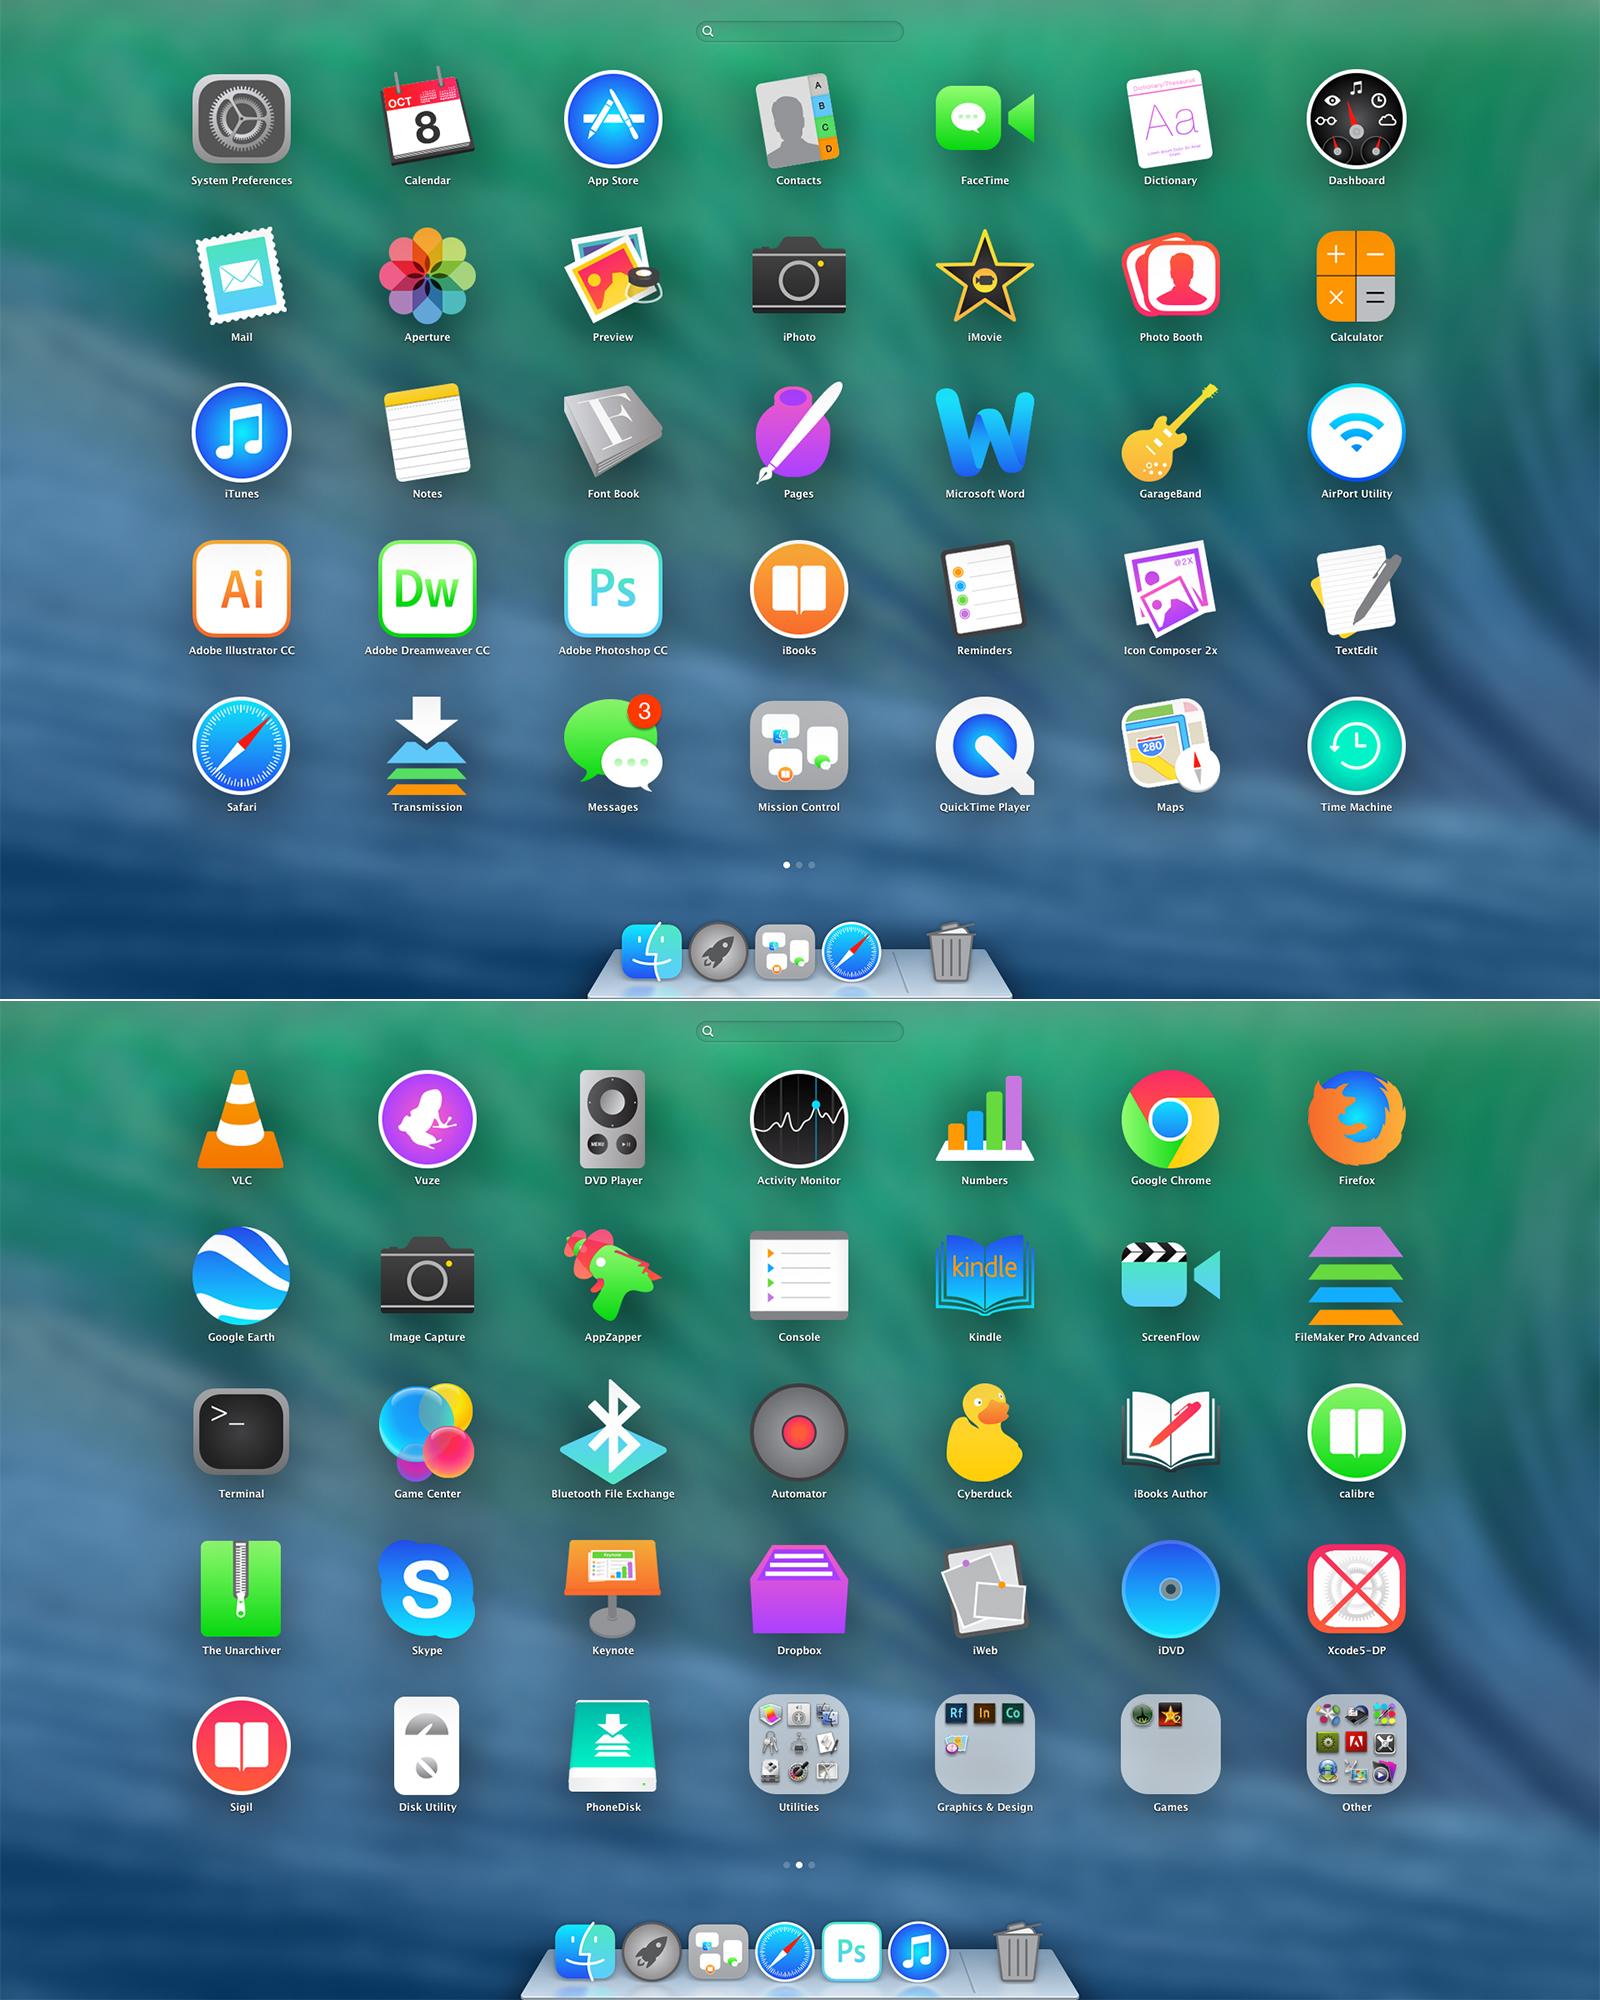 iOSX7 by nateblunt